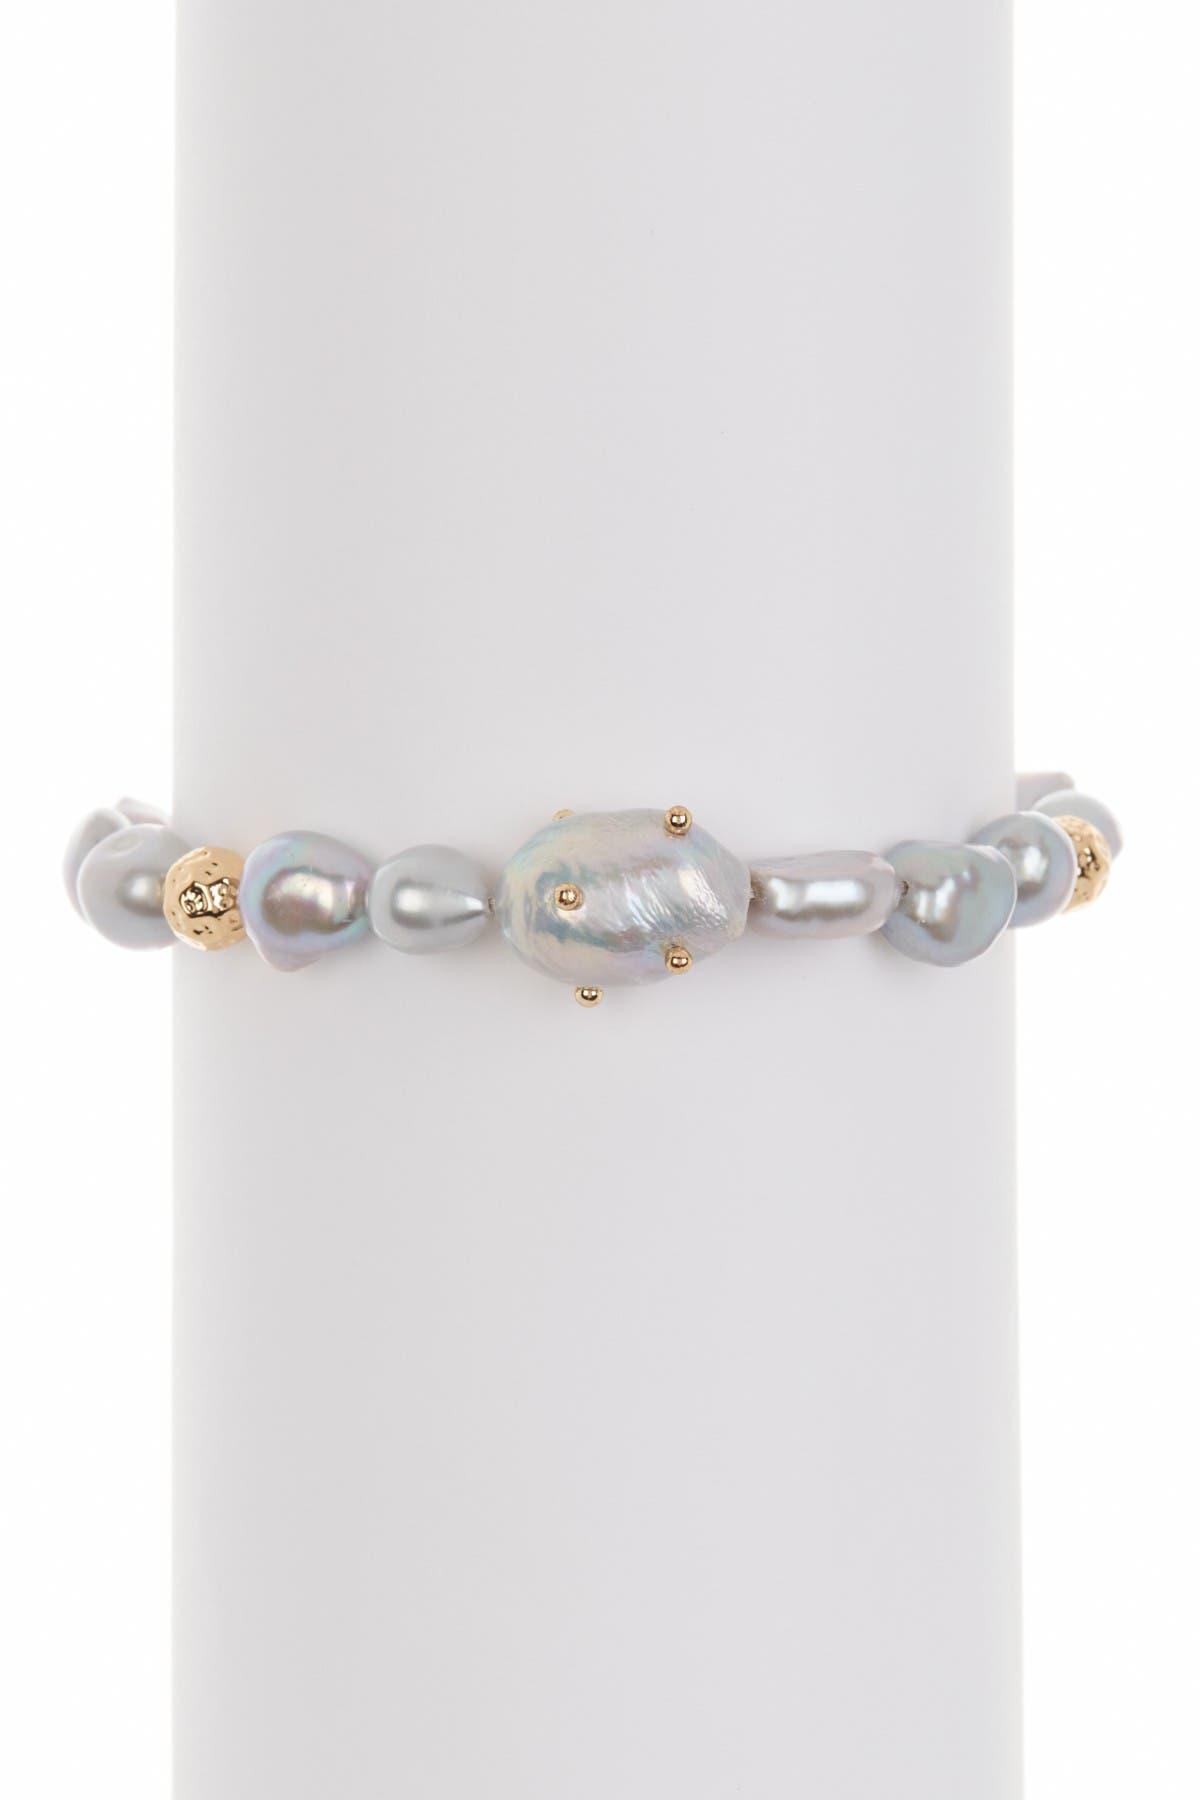 Image of Rebecca Minkoff Studded Baroque Pearl Bracelet